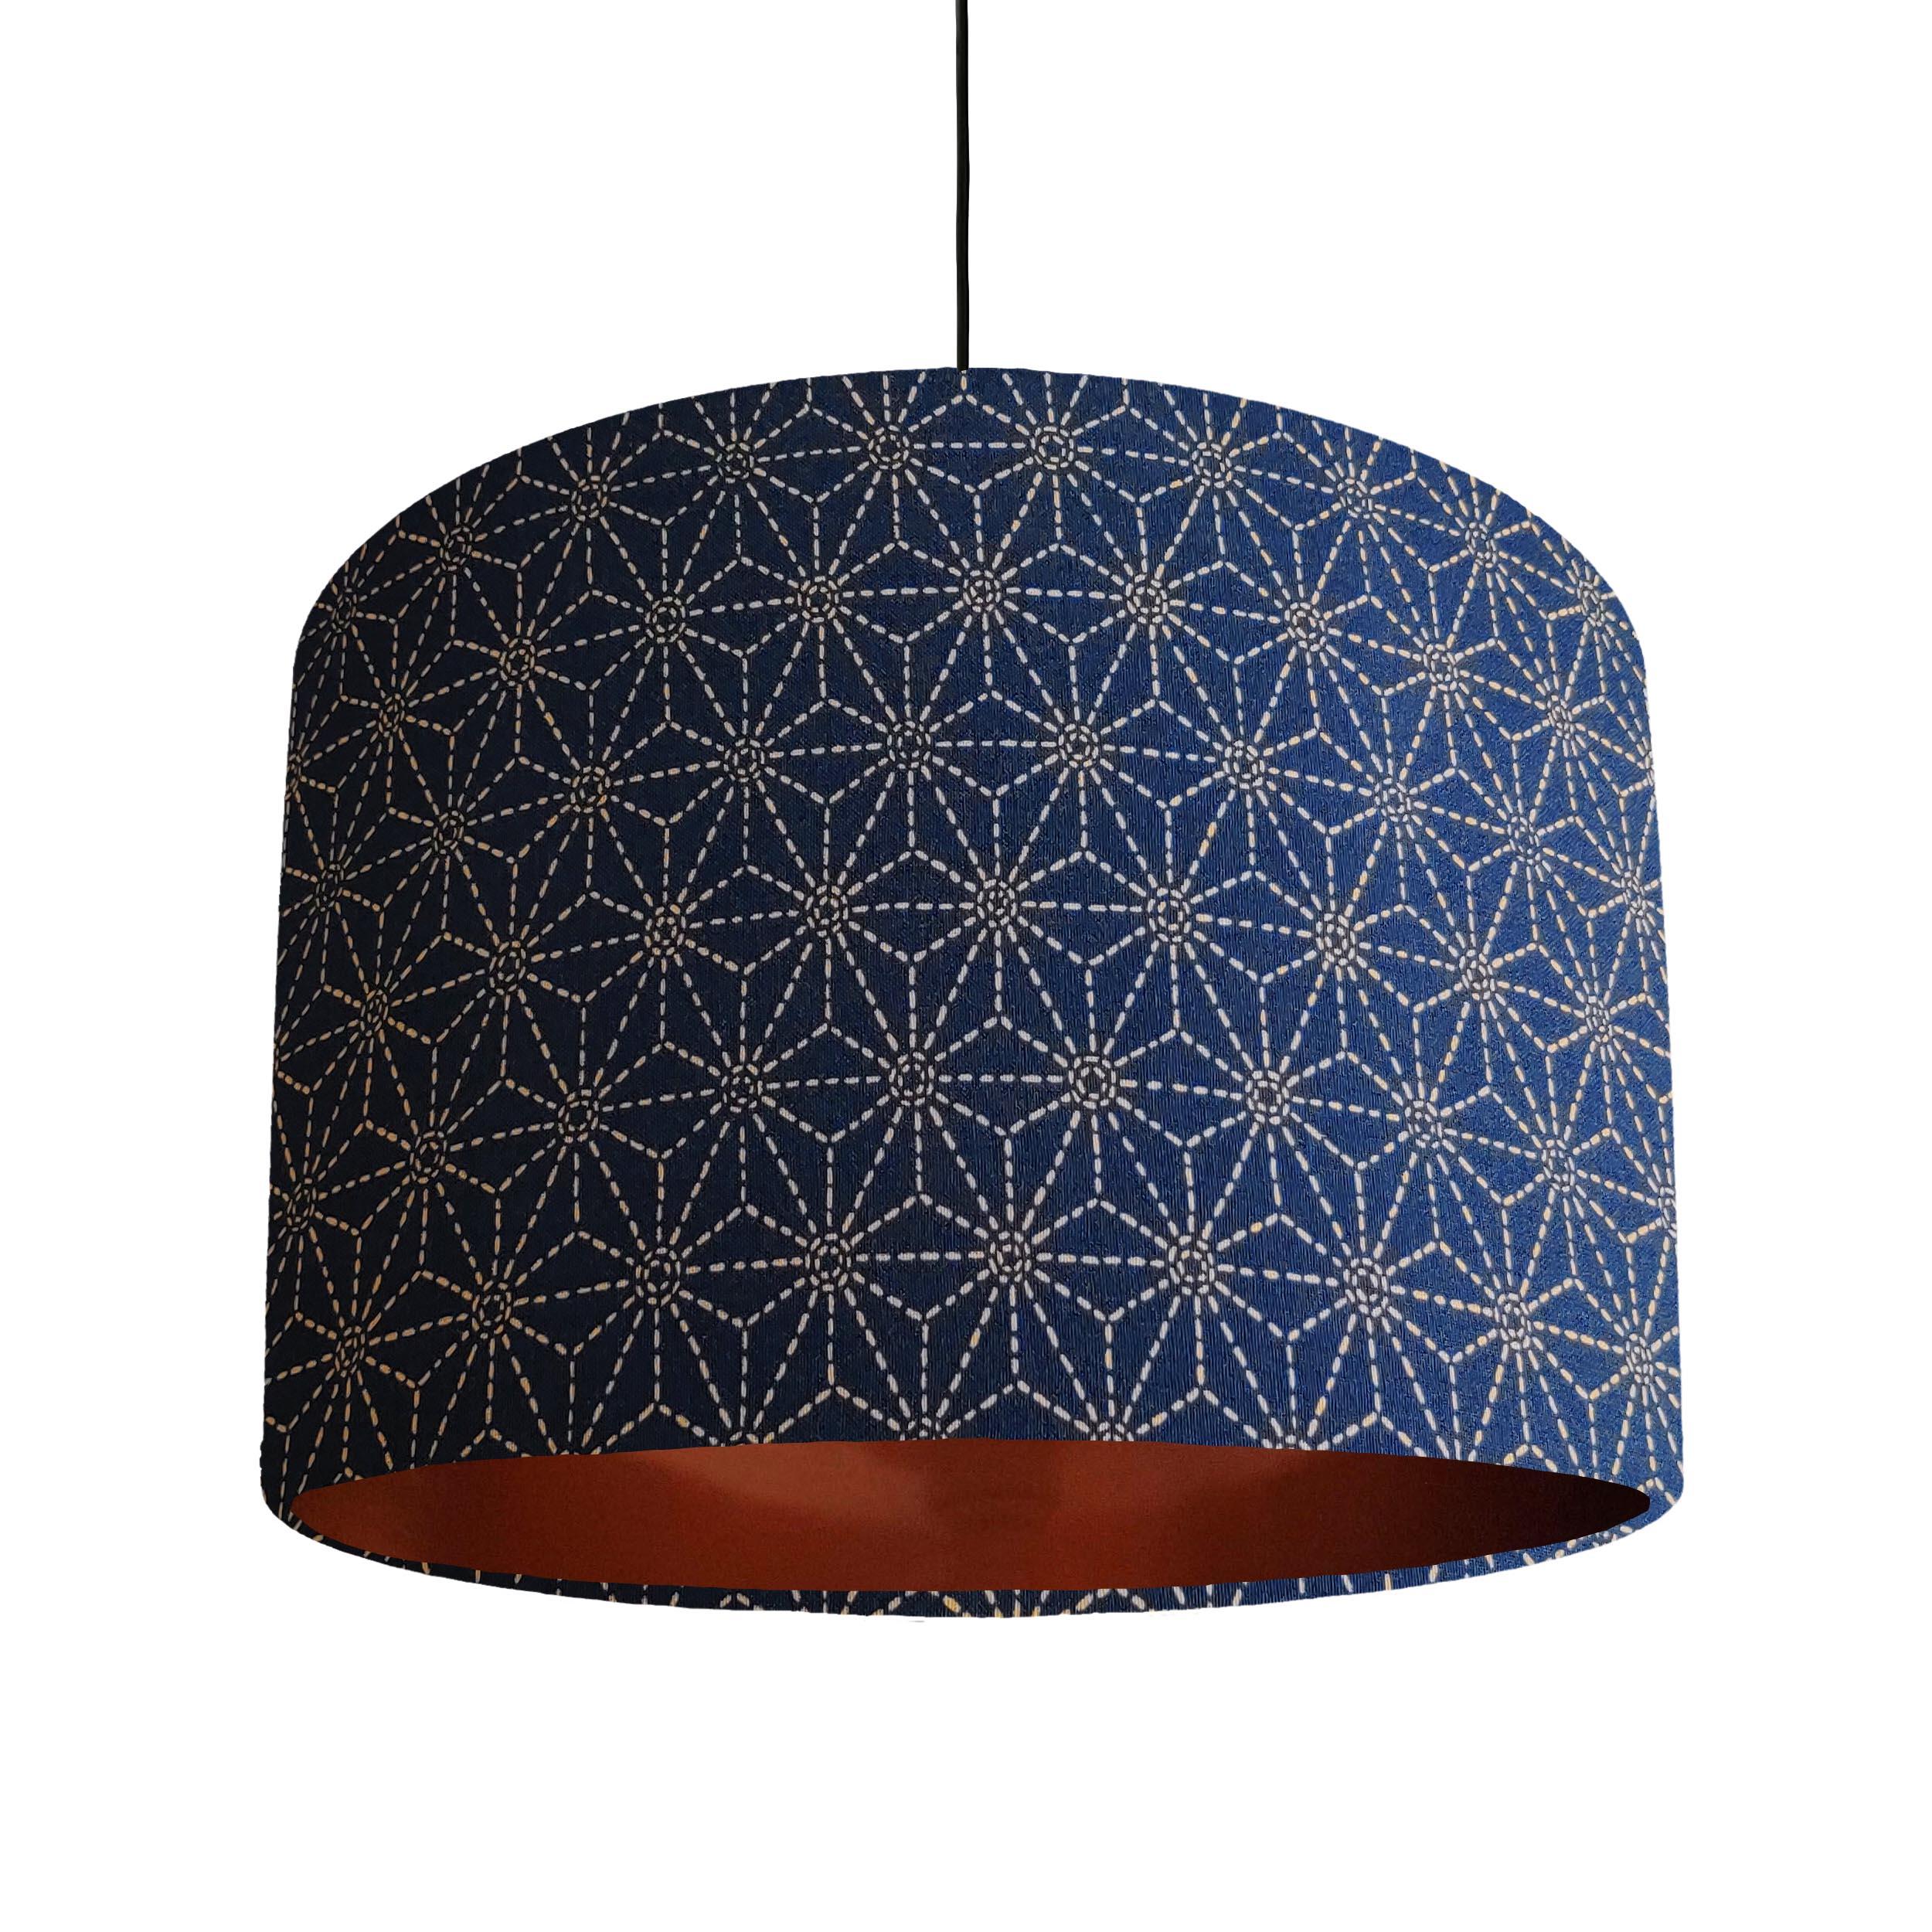 Indigo Blue Kasuri Lampshade with a Brushed Copper Lining